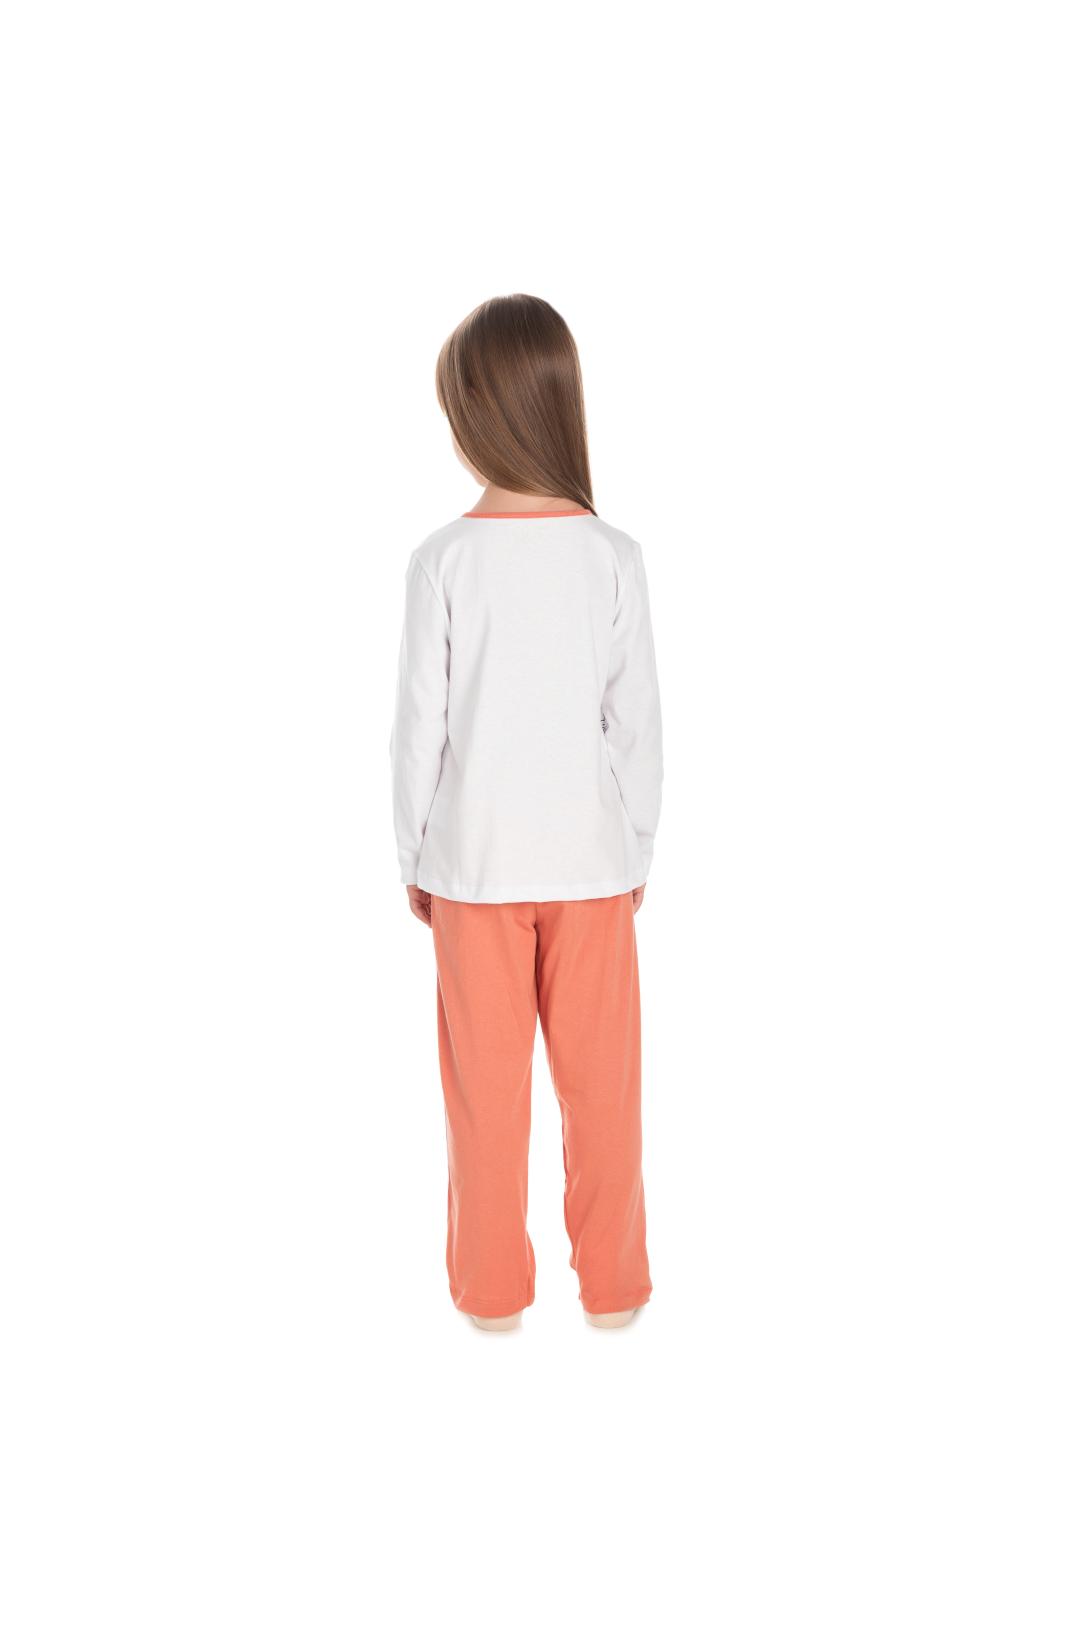 220/D - Pijama Infantil Feminino Urso